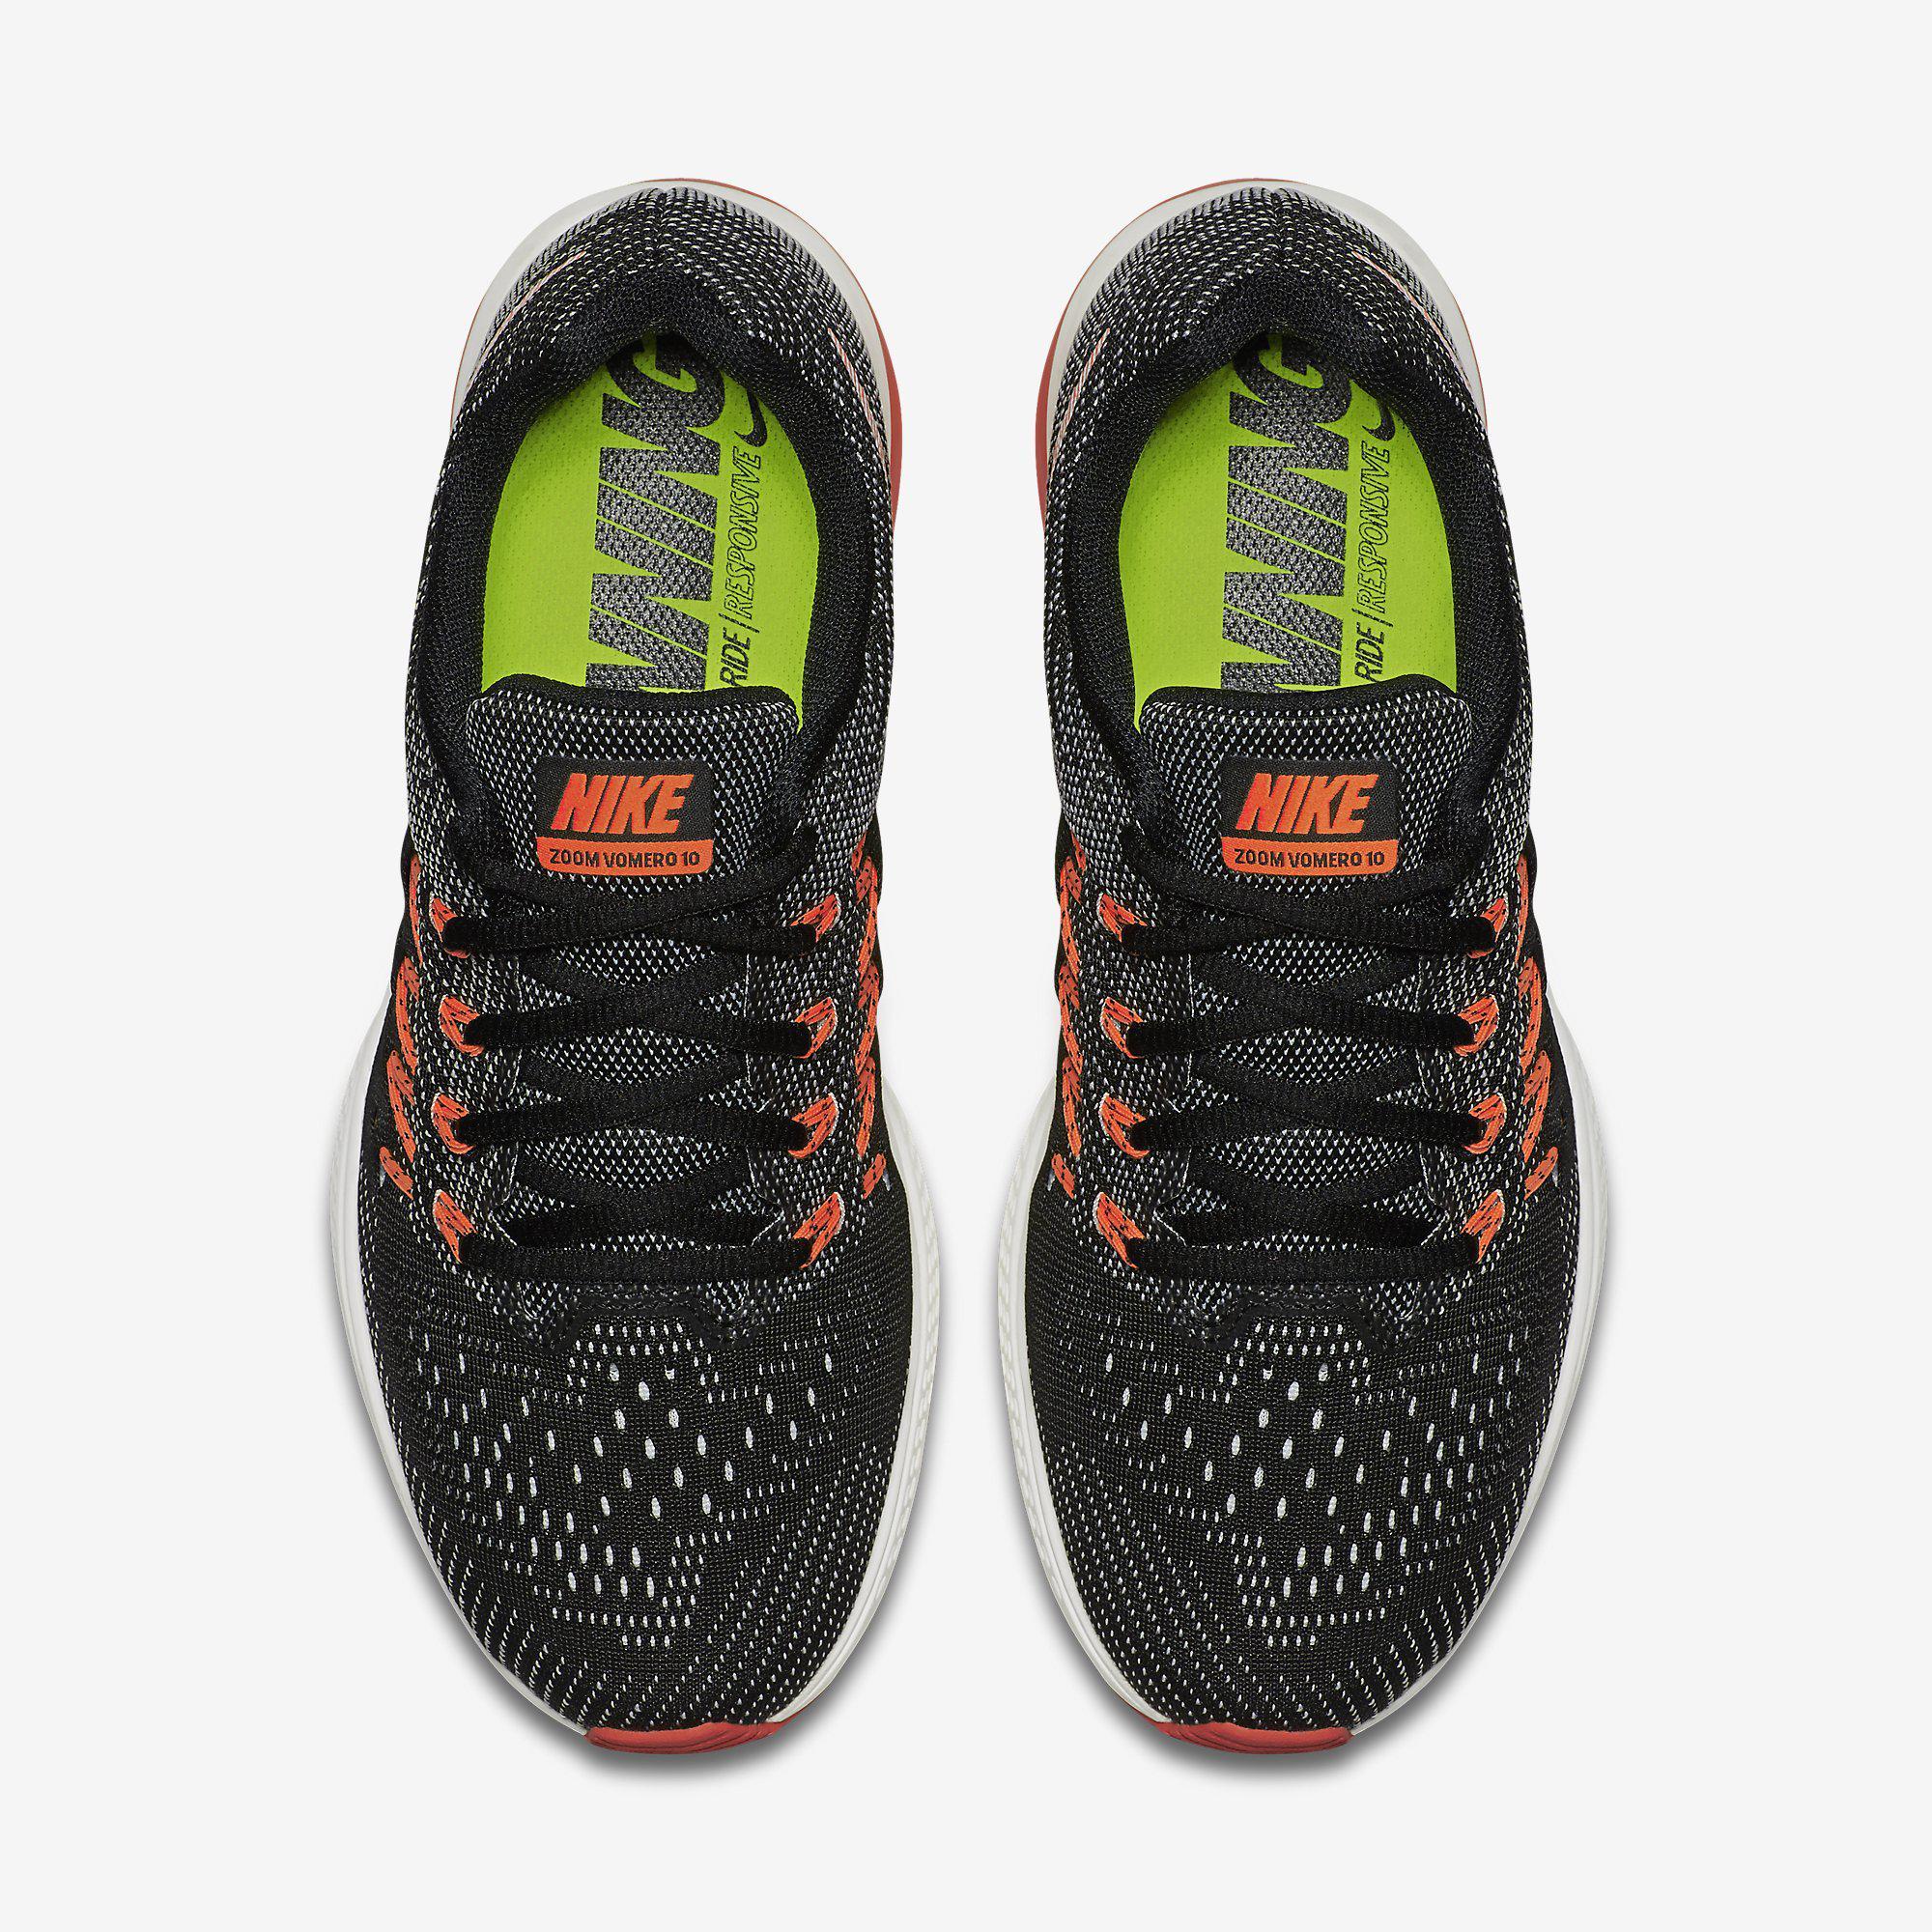 85409afe0aaf Nike Womens Air Zoom Vomero 10 Running Shoes - Black Orange ...